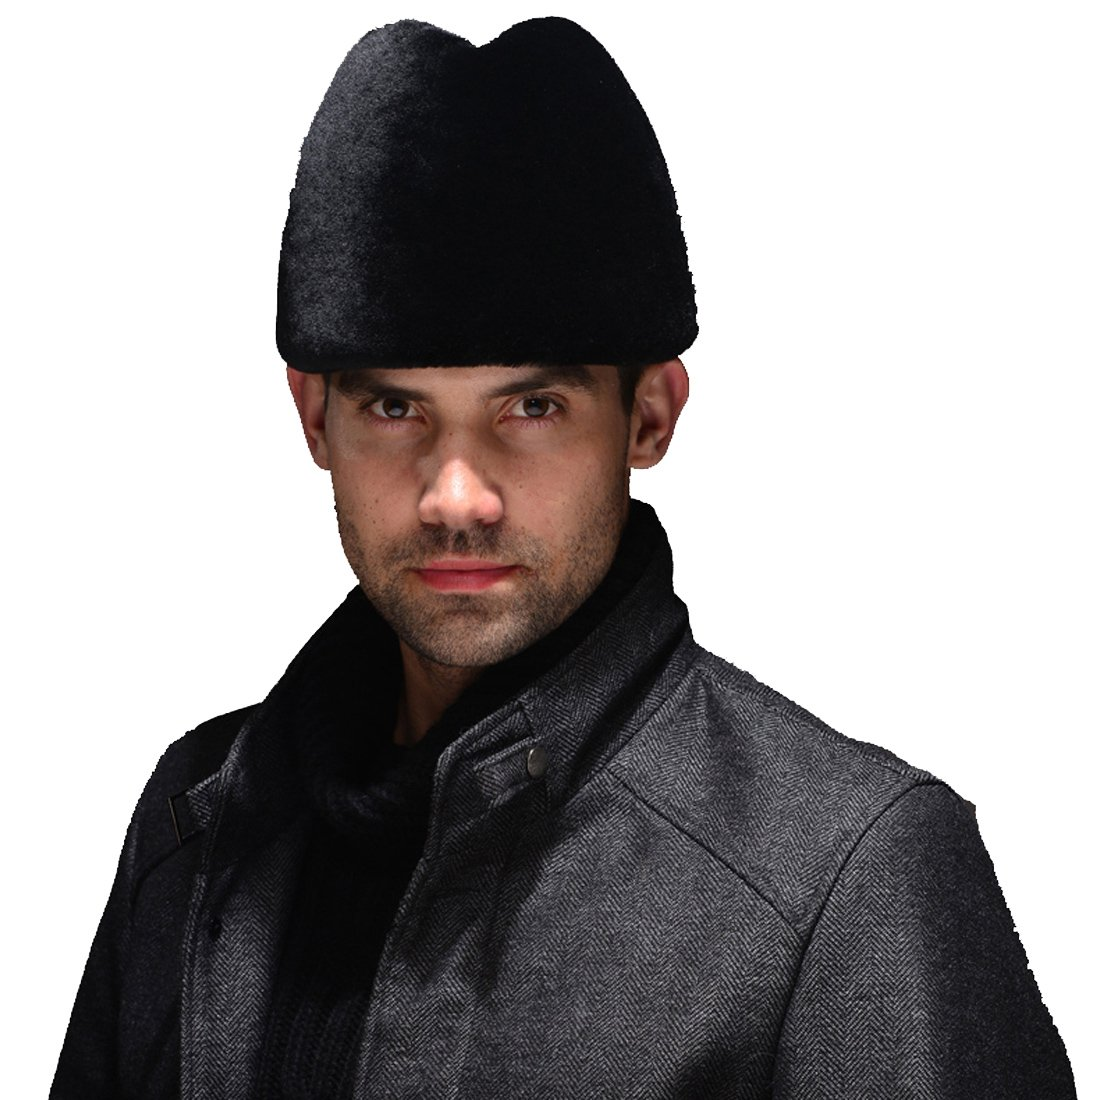 URSFUR Mouton Sheepskin Russian Cossack Hat (One Size, Black) by URSFUR